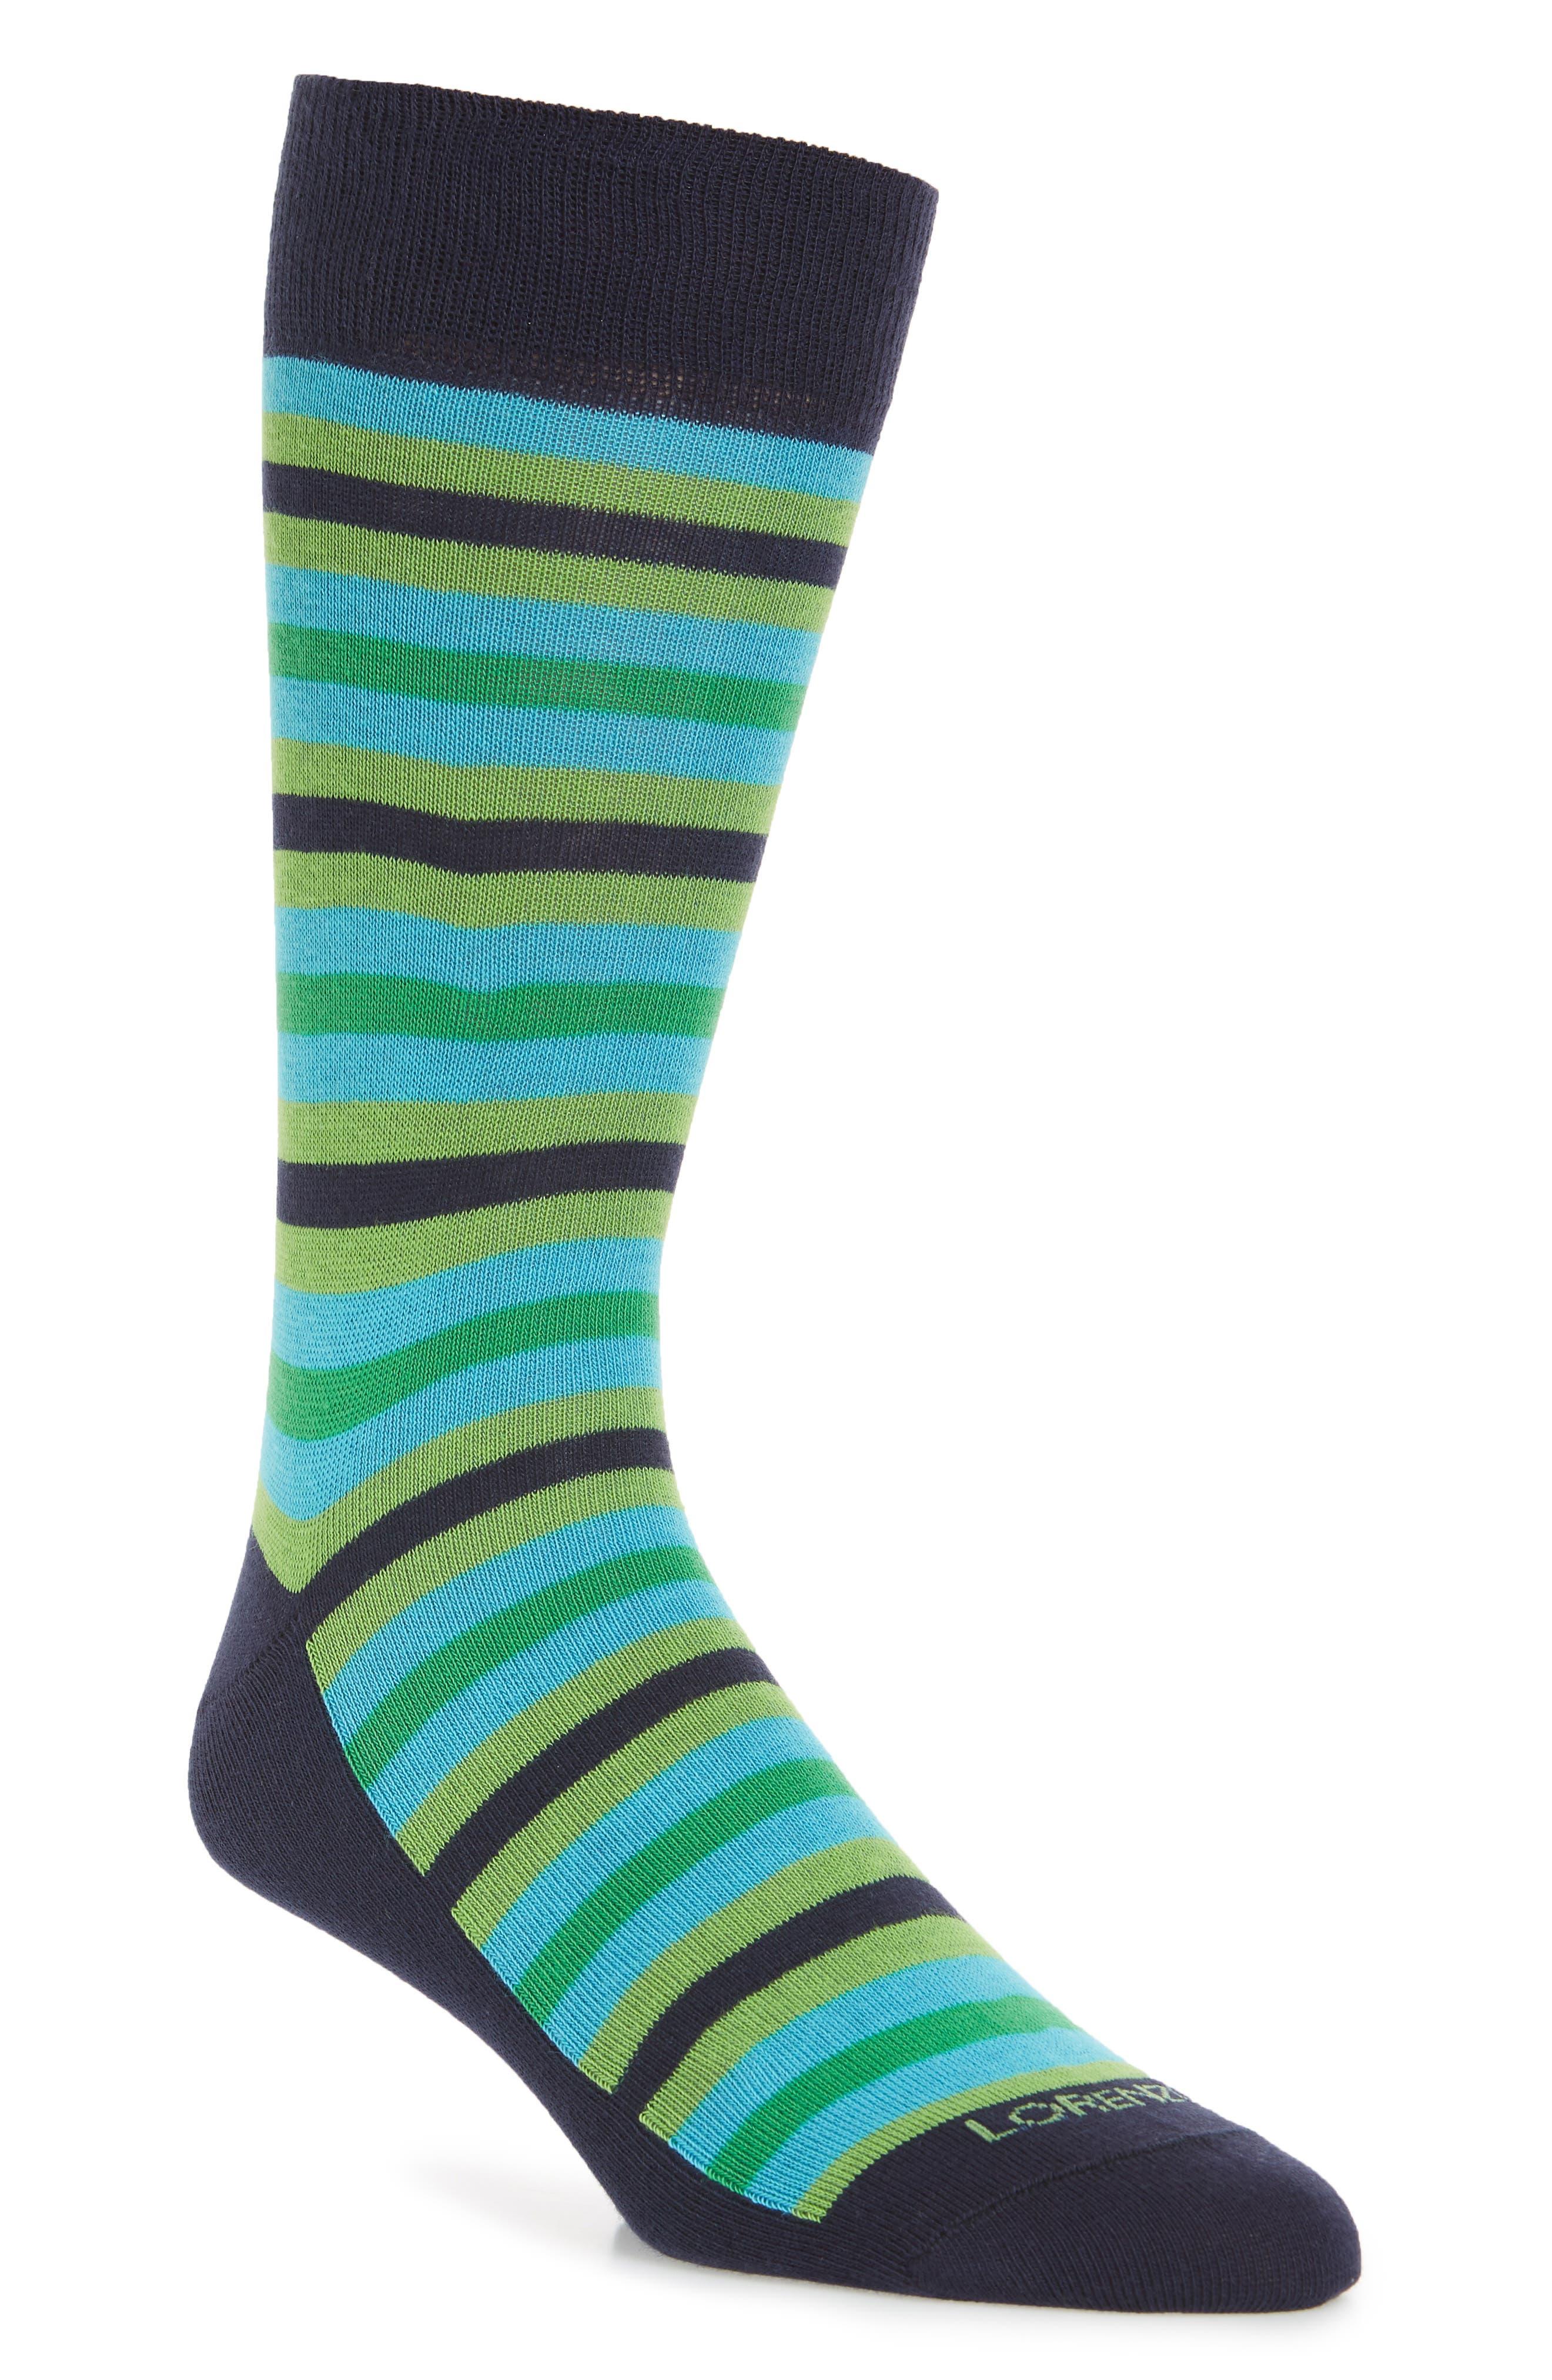 Organic Stripe Socks,                         Main,                         color, 410